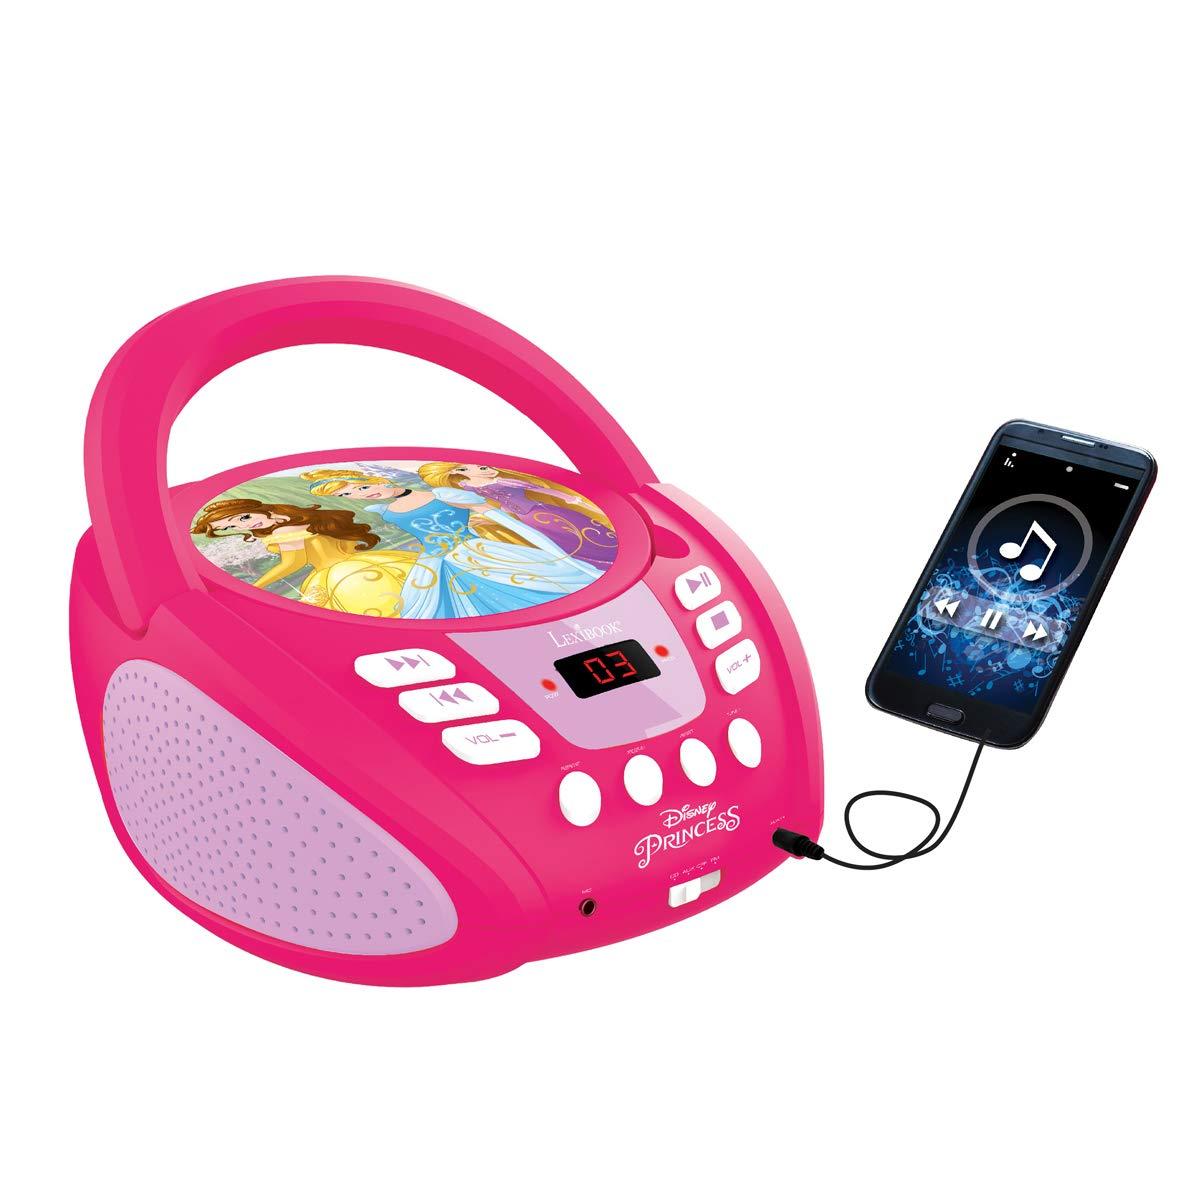 LEXiBOOK Disney Princess Boombox Radio CD Player by LEXiBOOK (Image #7)